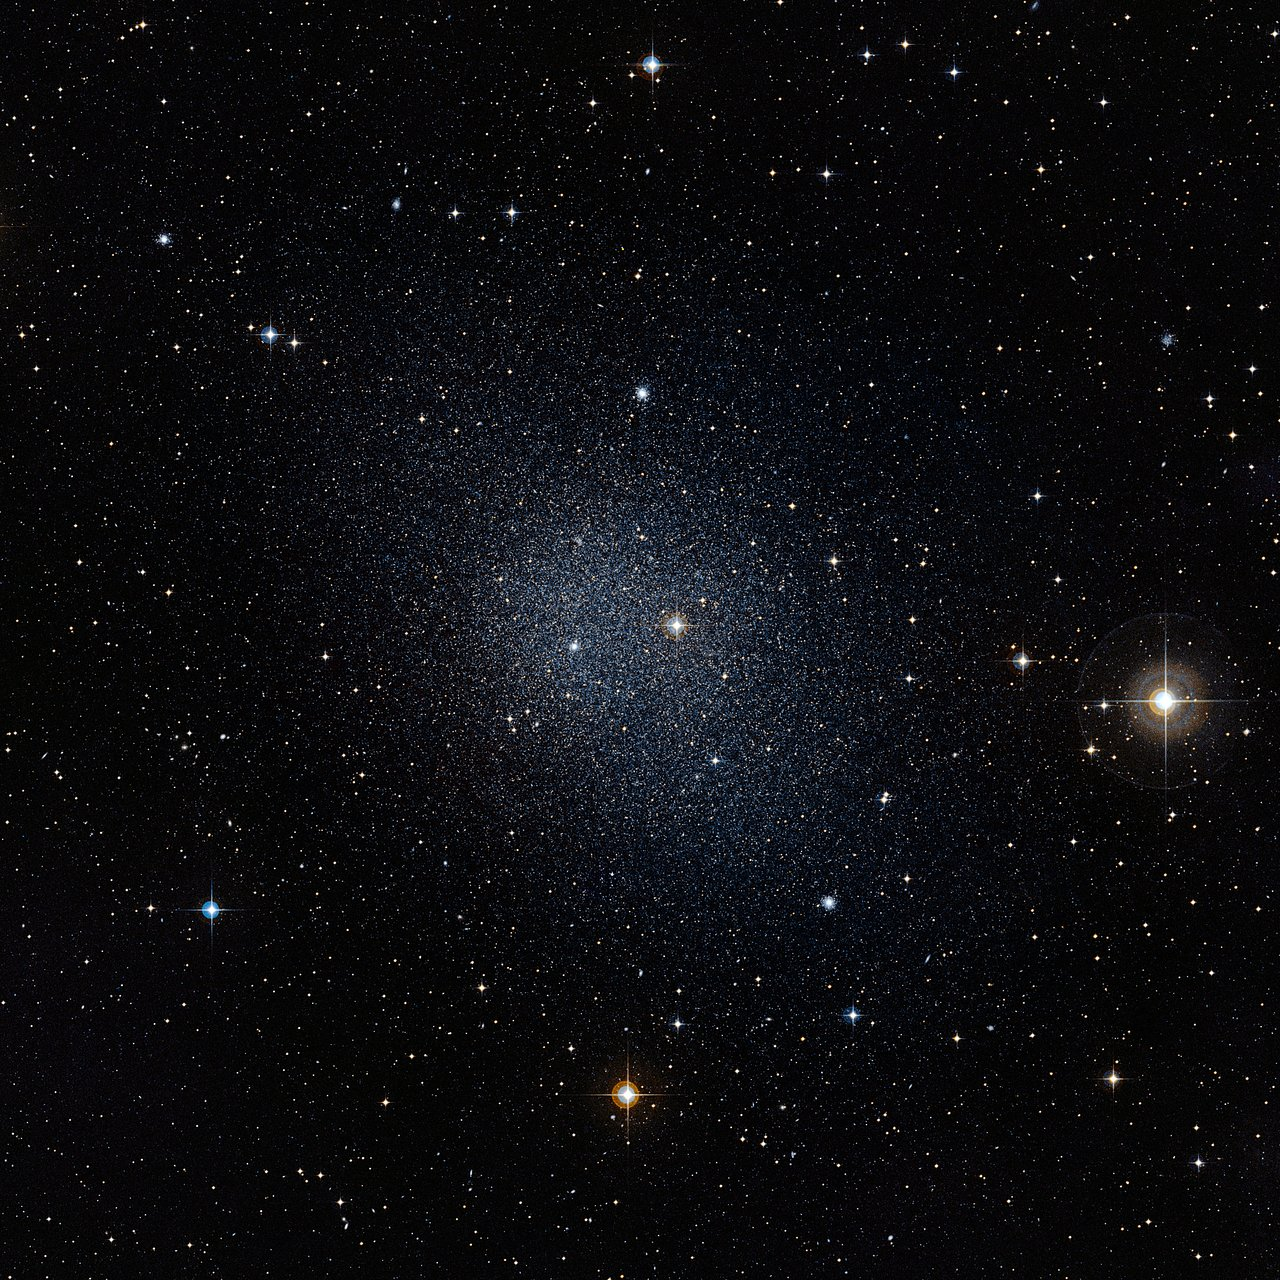 The Fornax dwarf galaxy